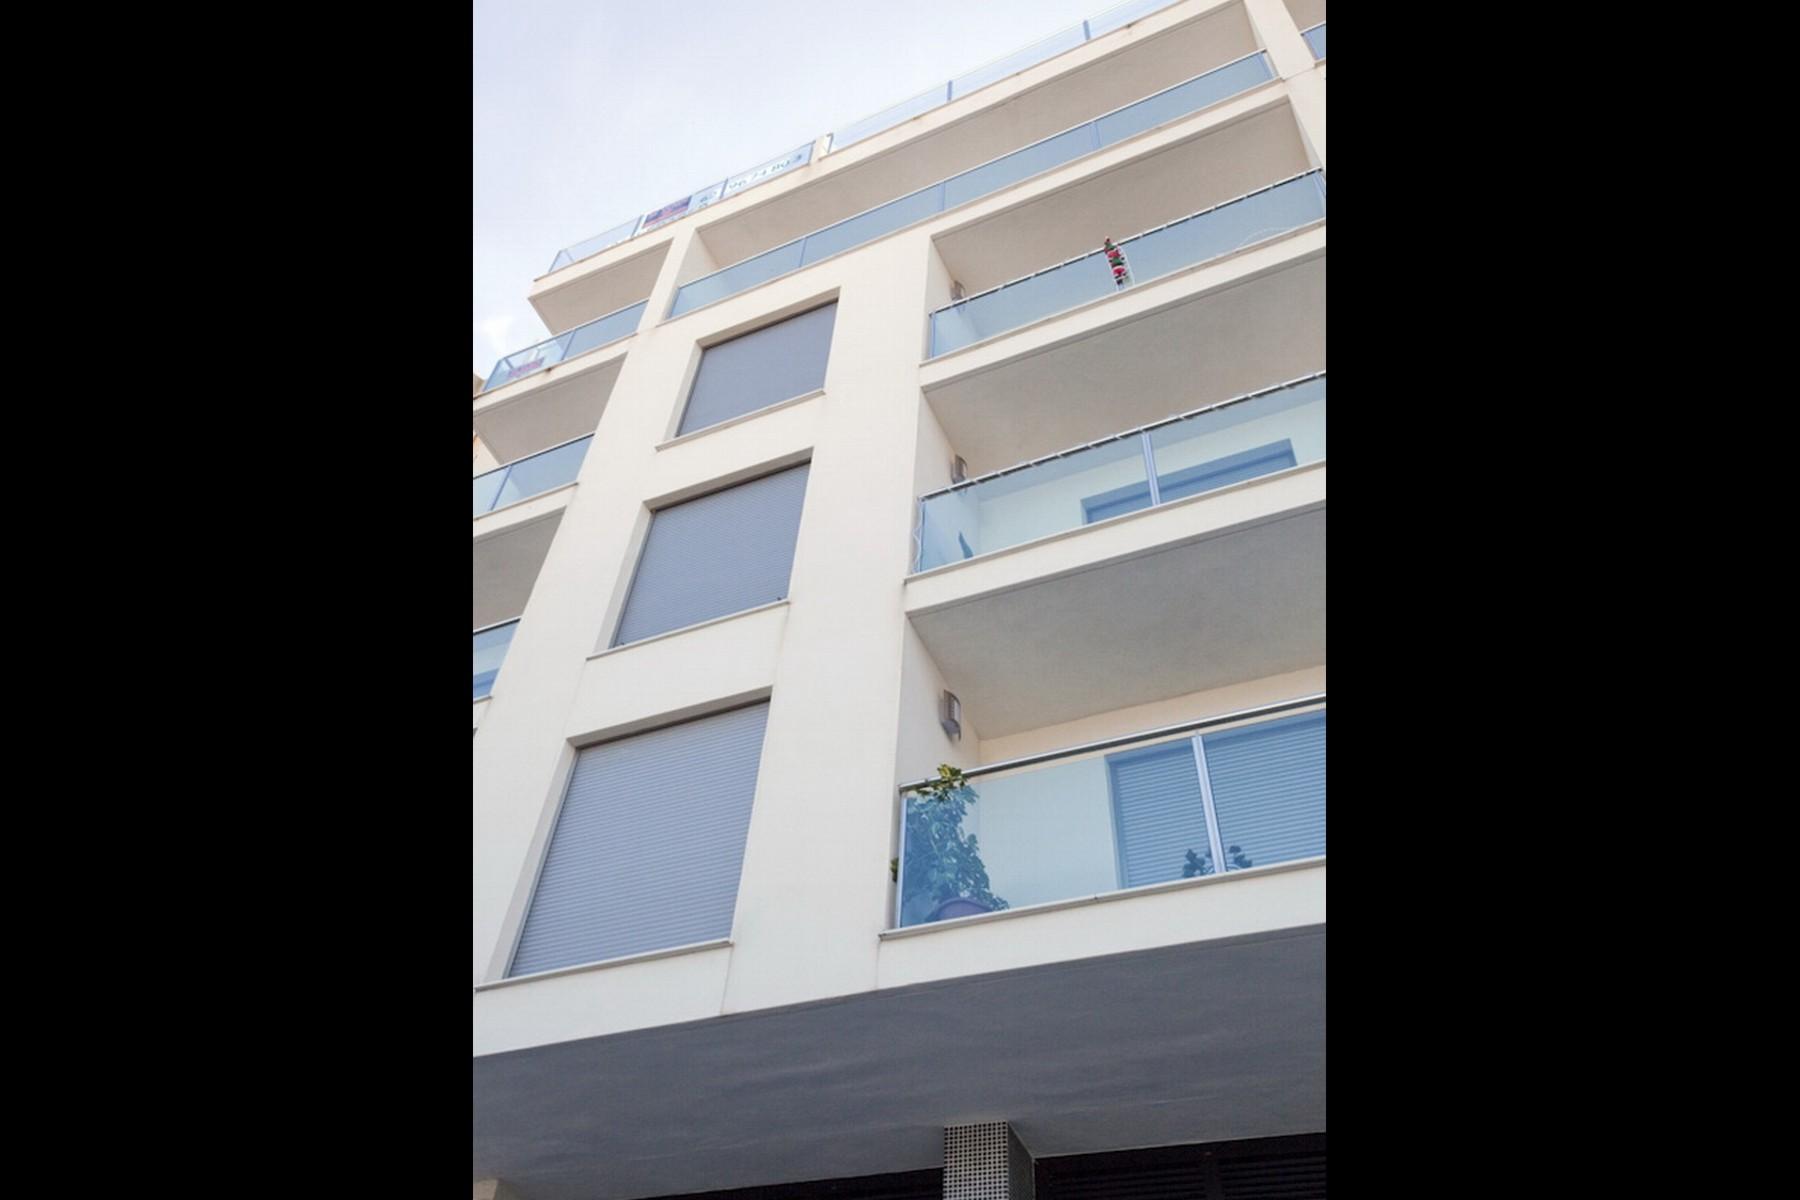 Imaginarq-042-edificio-viviendas.-Pego.-Alicante.04A